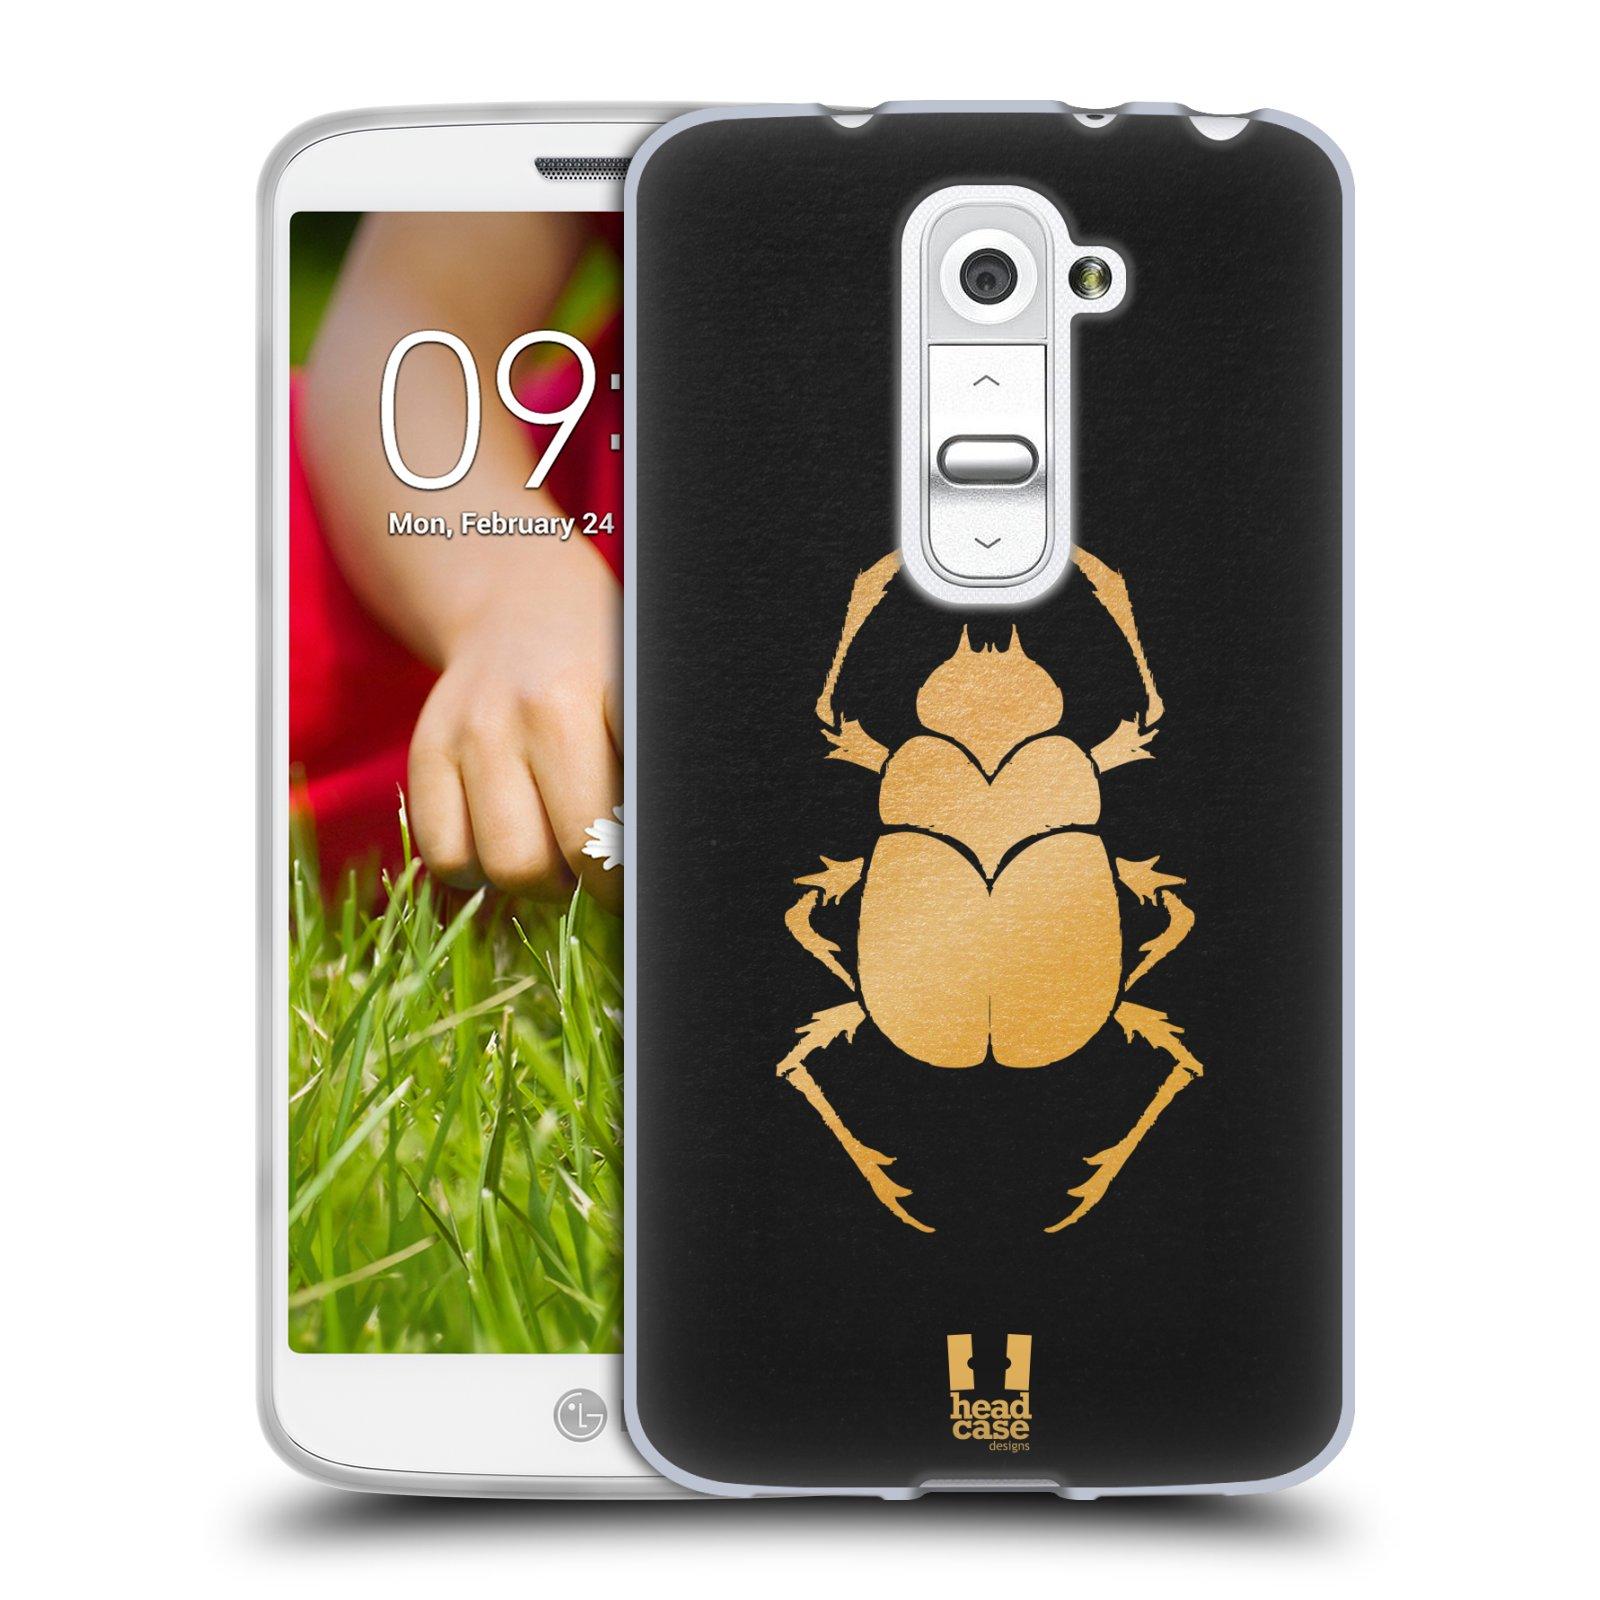 Silikonové pouzdro na mobil LG G2 Mini HEAD CASE EGYPT SCARABEUS (Silikonový kryt či obal na mobilní telefon LG G2 Mini D620)